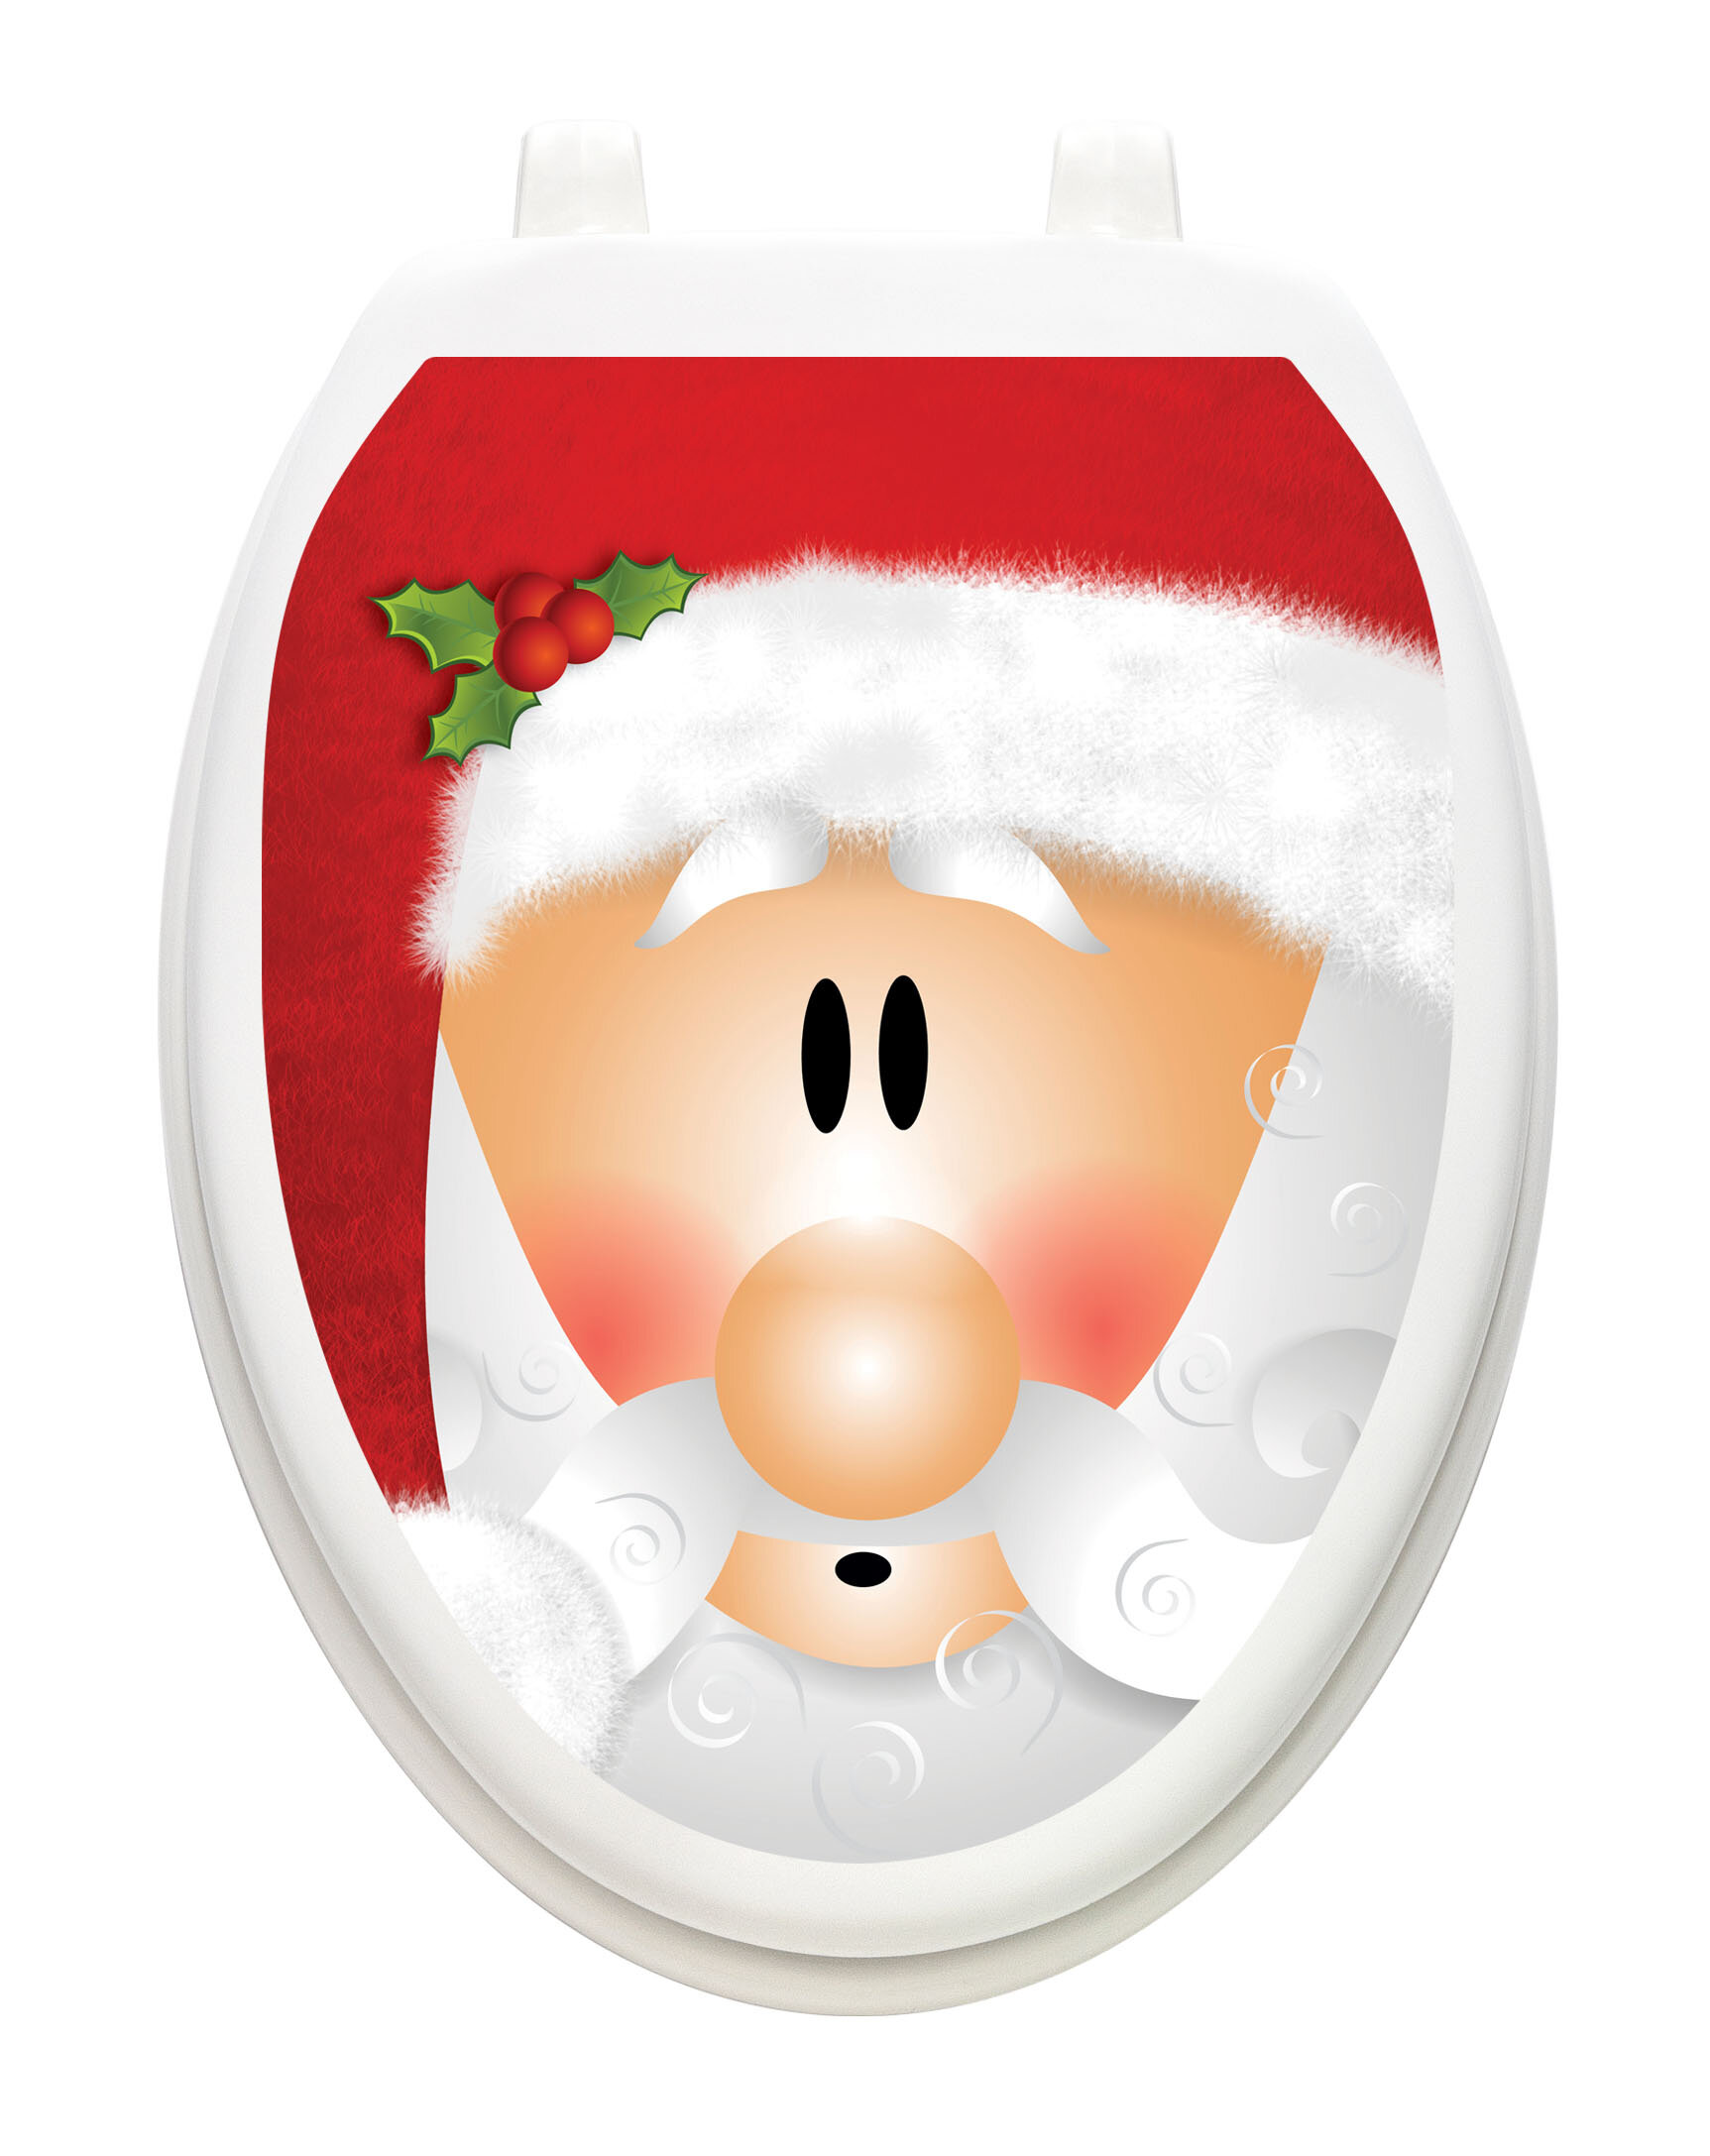 Toilet Tattoos Santa Claus Toilet Seat Decal Reviews Wayfair